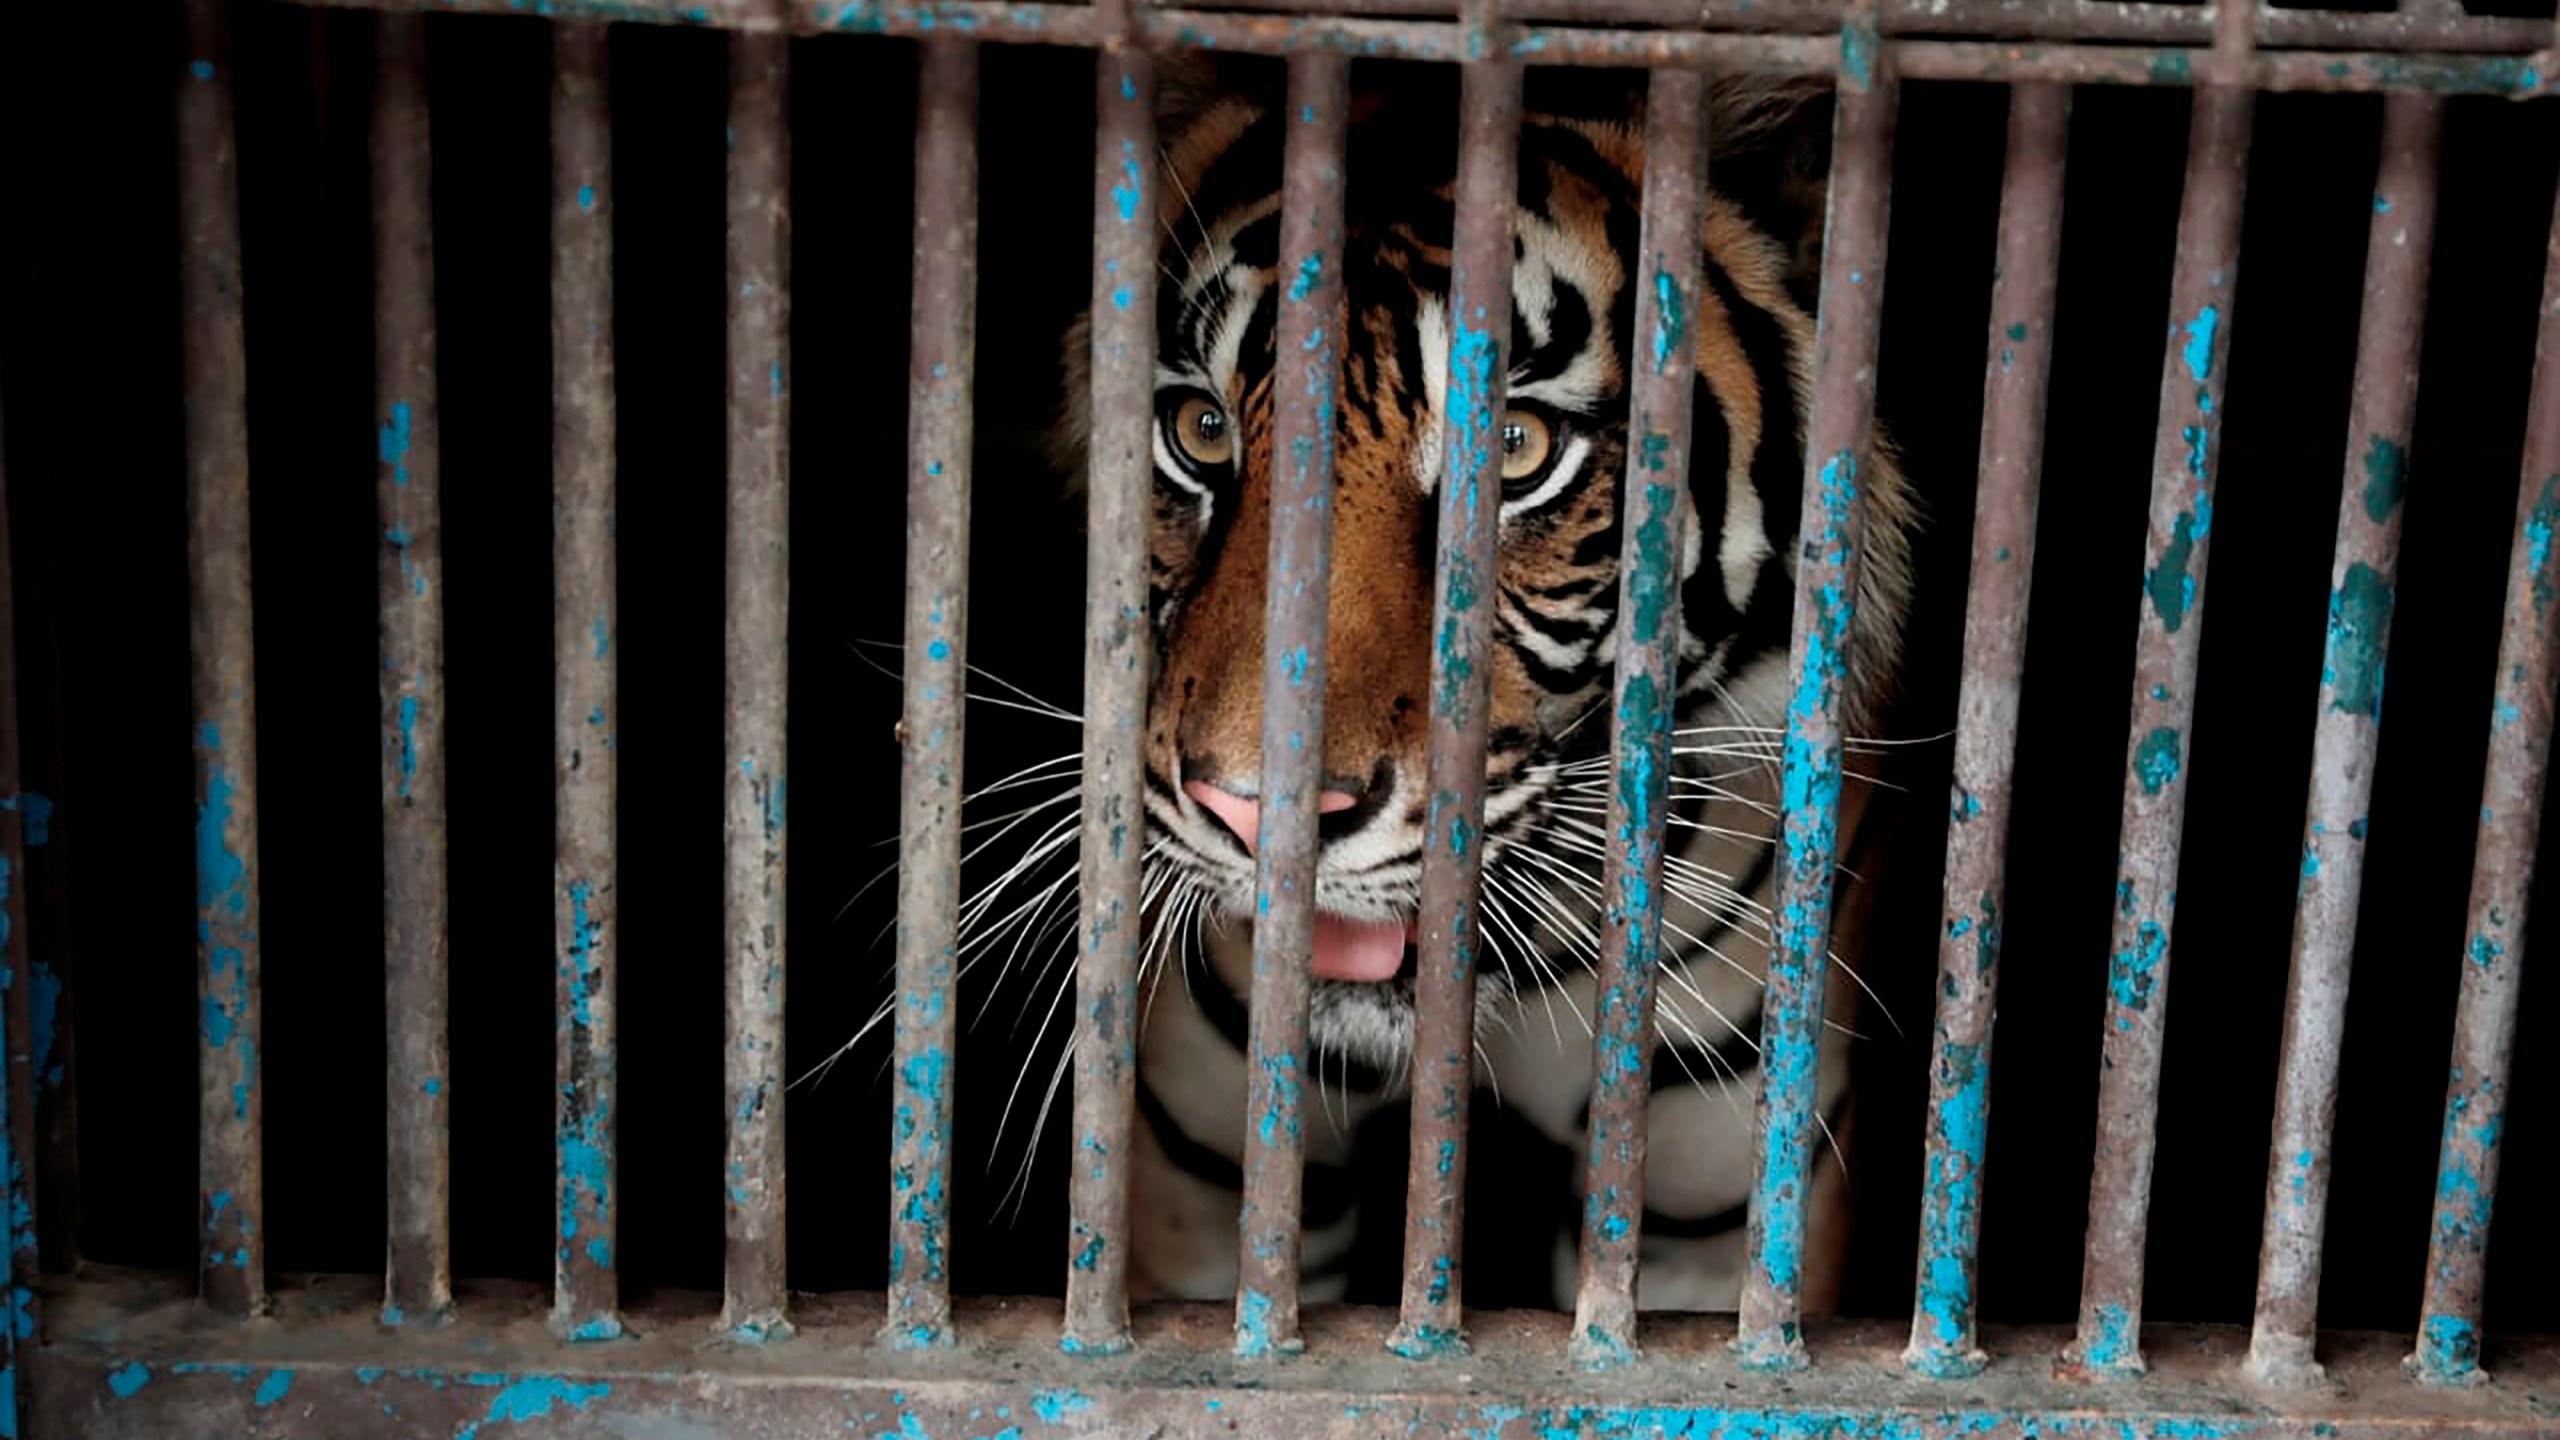 Sumatran tigers